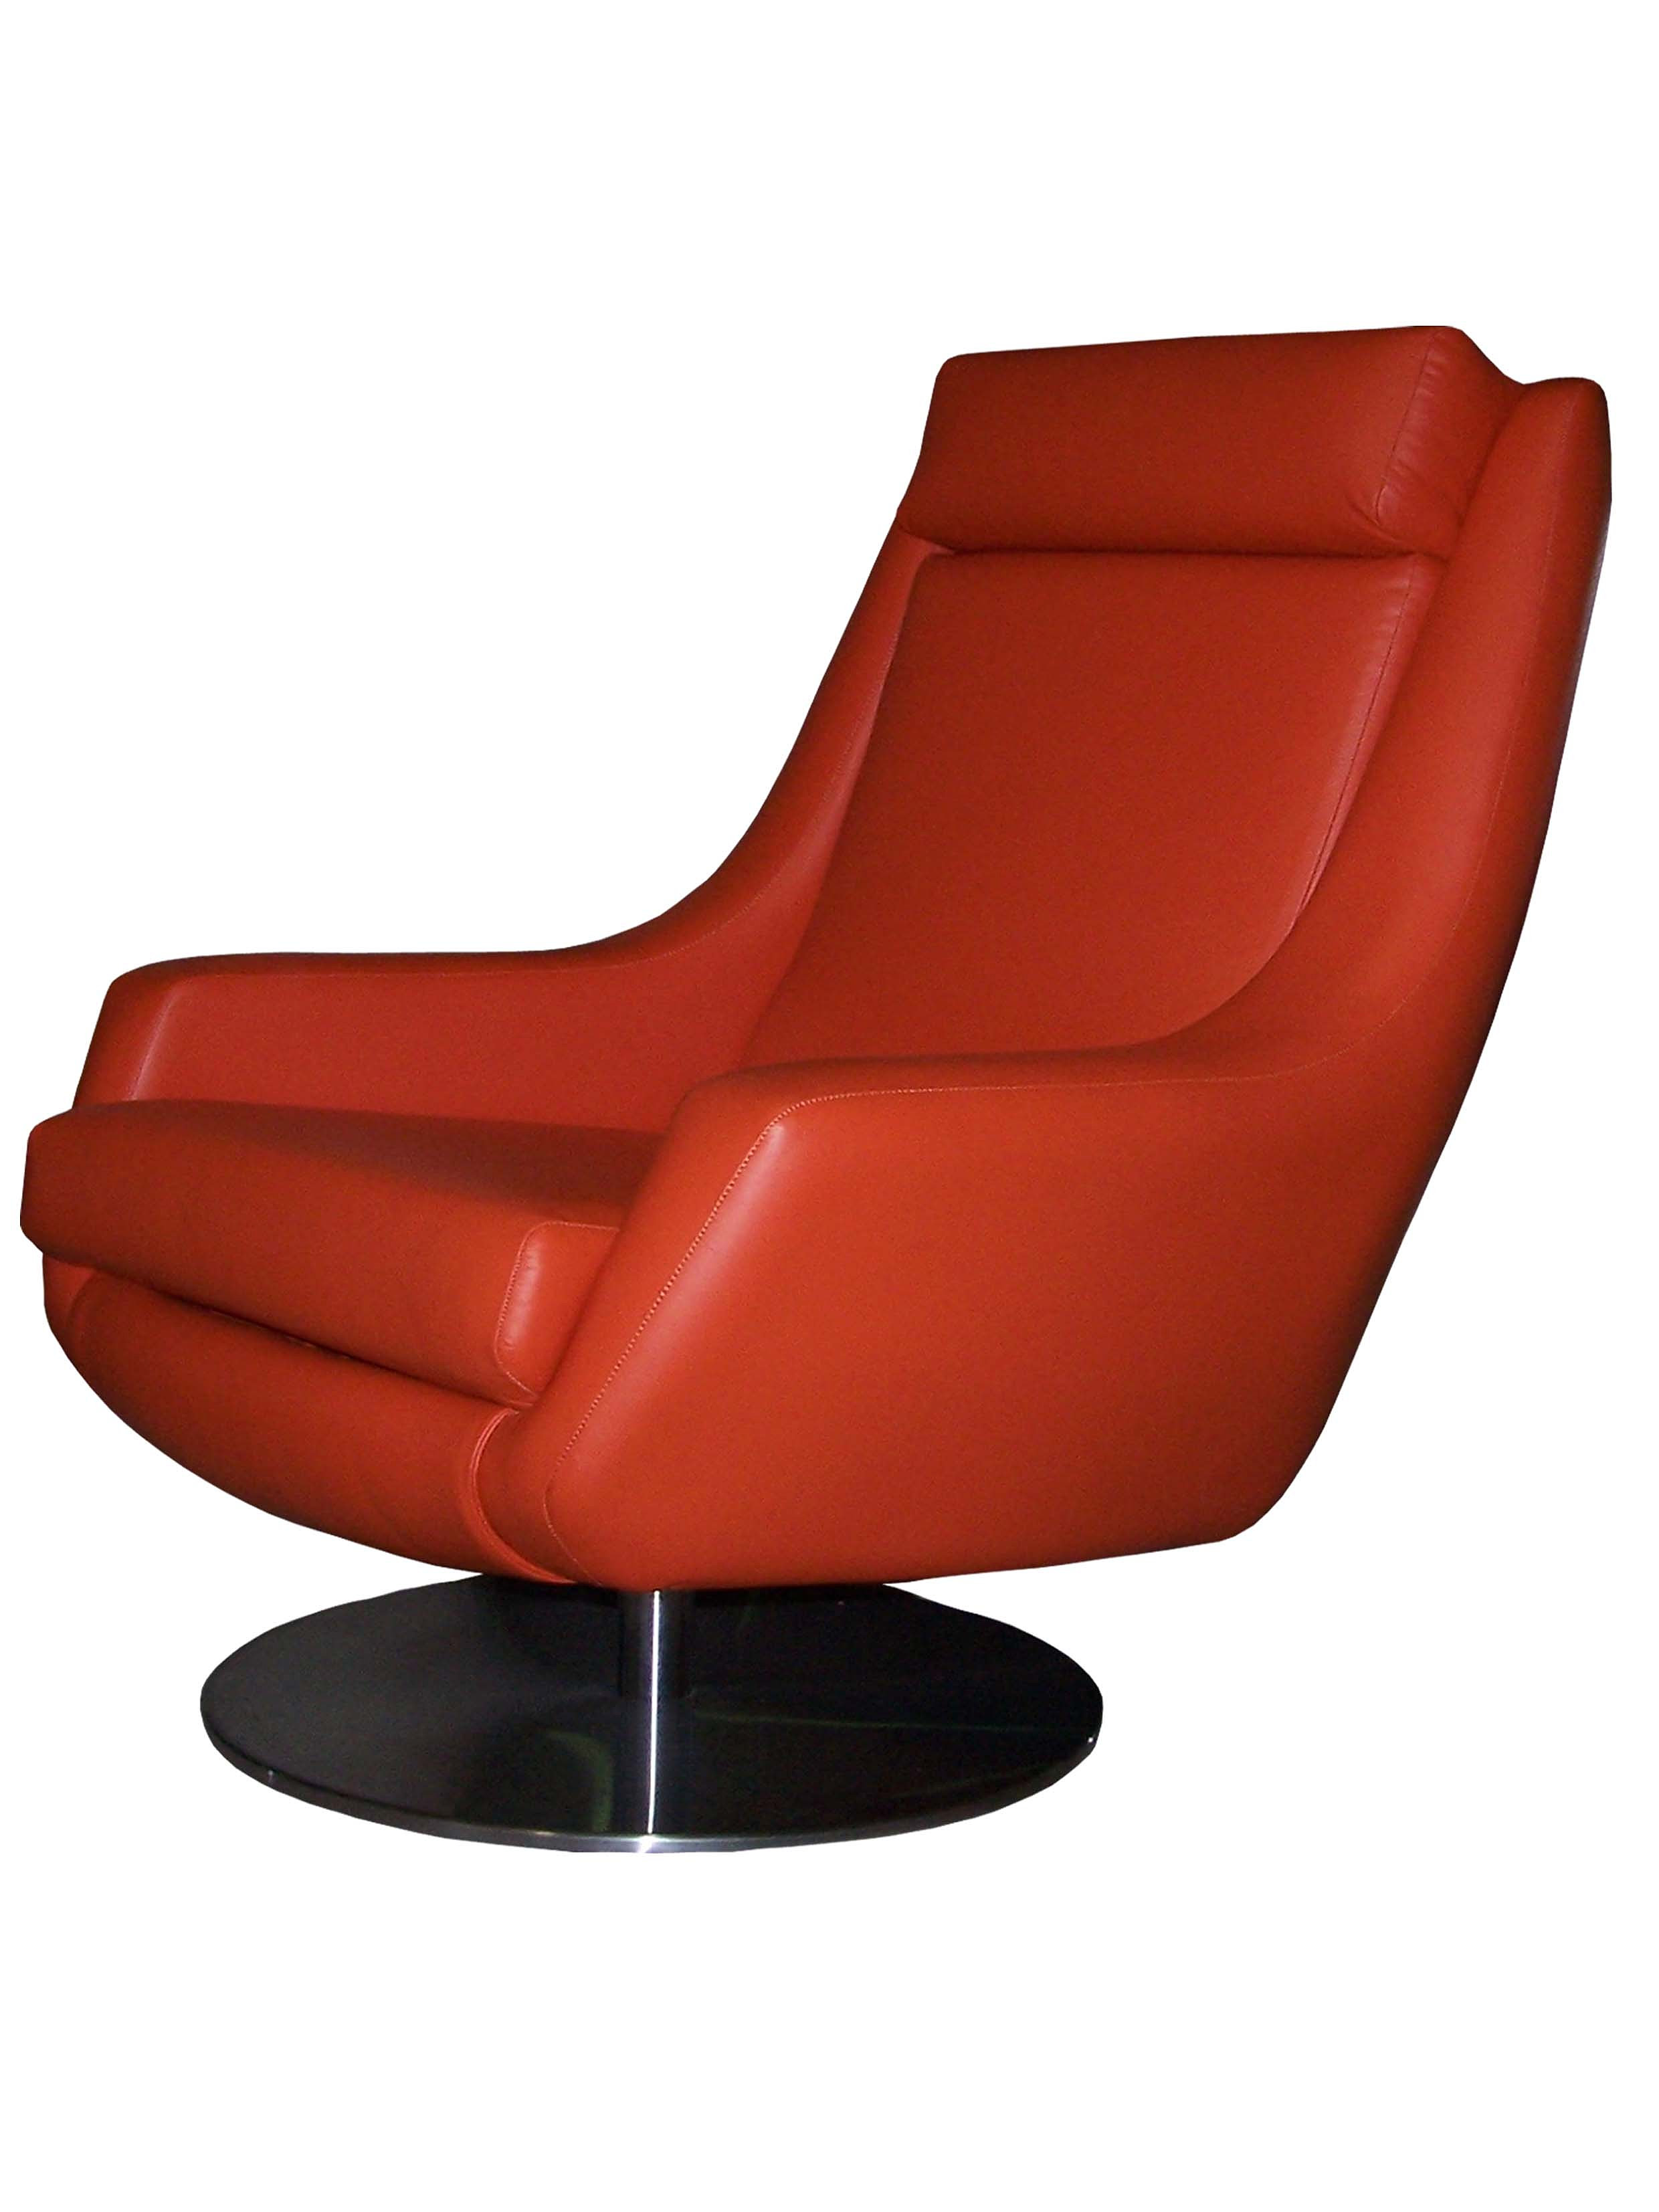 Retro Furniture Upholsterers Gold Coast Upholstery